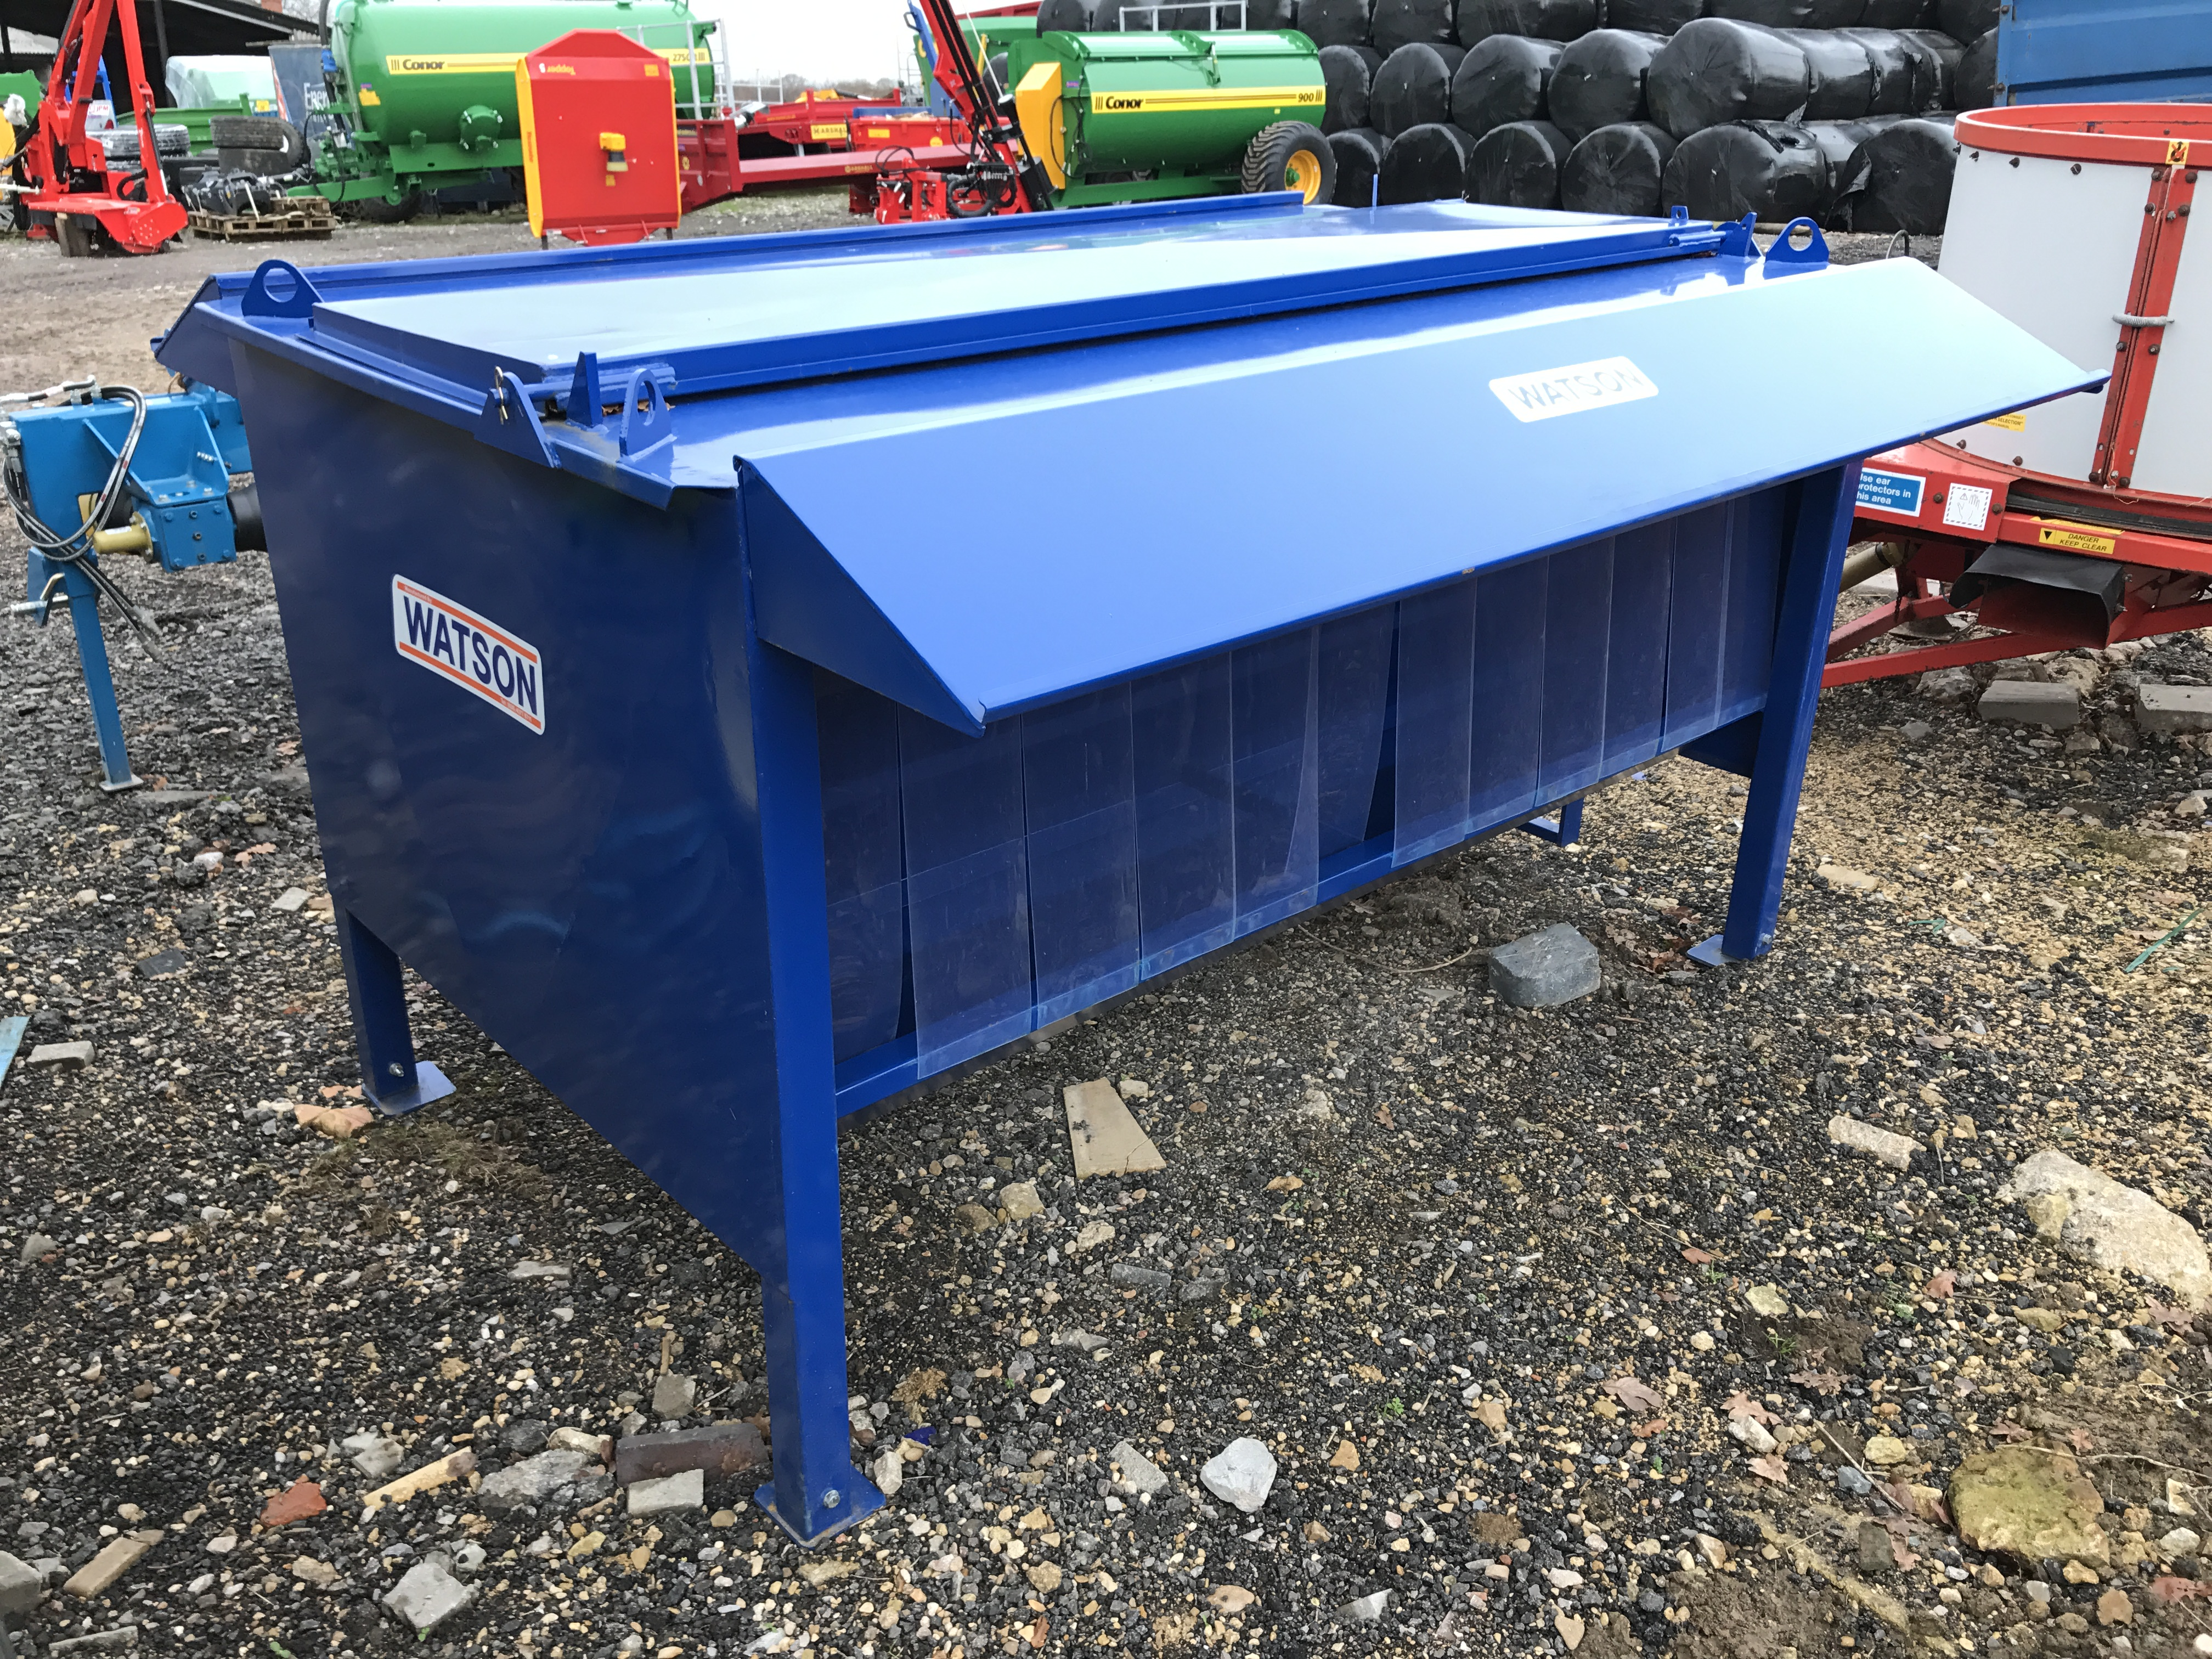 carton inclined spiral china bucker screw feeder product lifting auger yngmlvtkyekr conveyor z